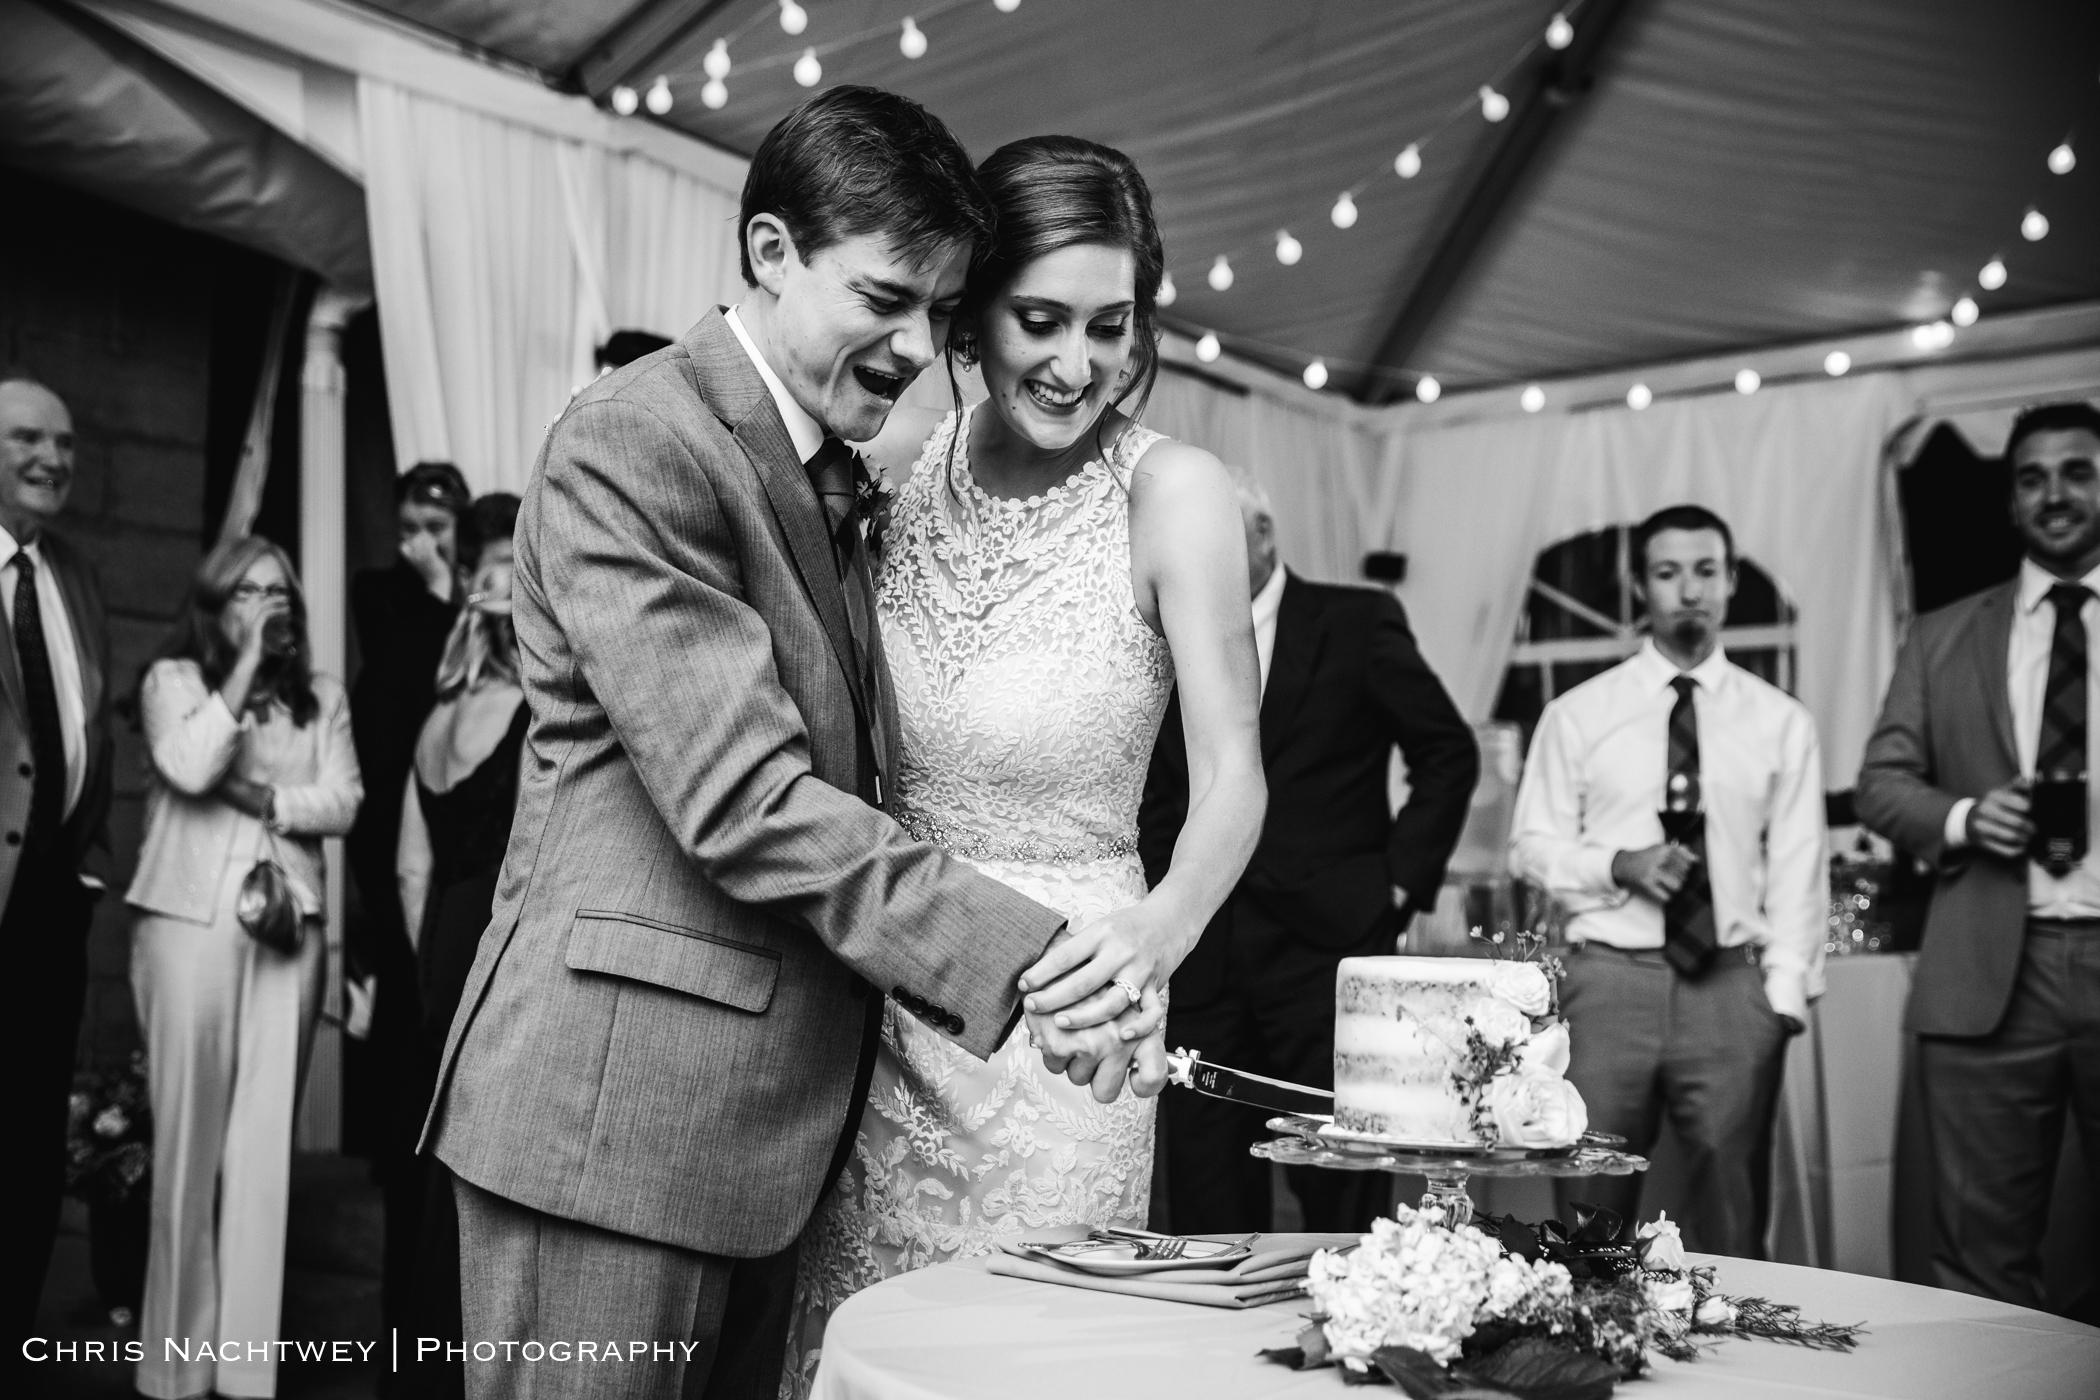 harkness-wedding-photos-chris-nachtwey-photography-2018-36.jpg